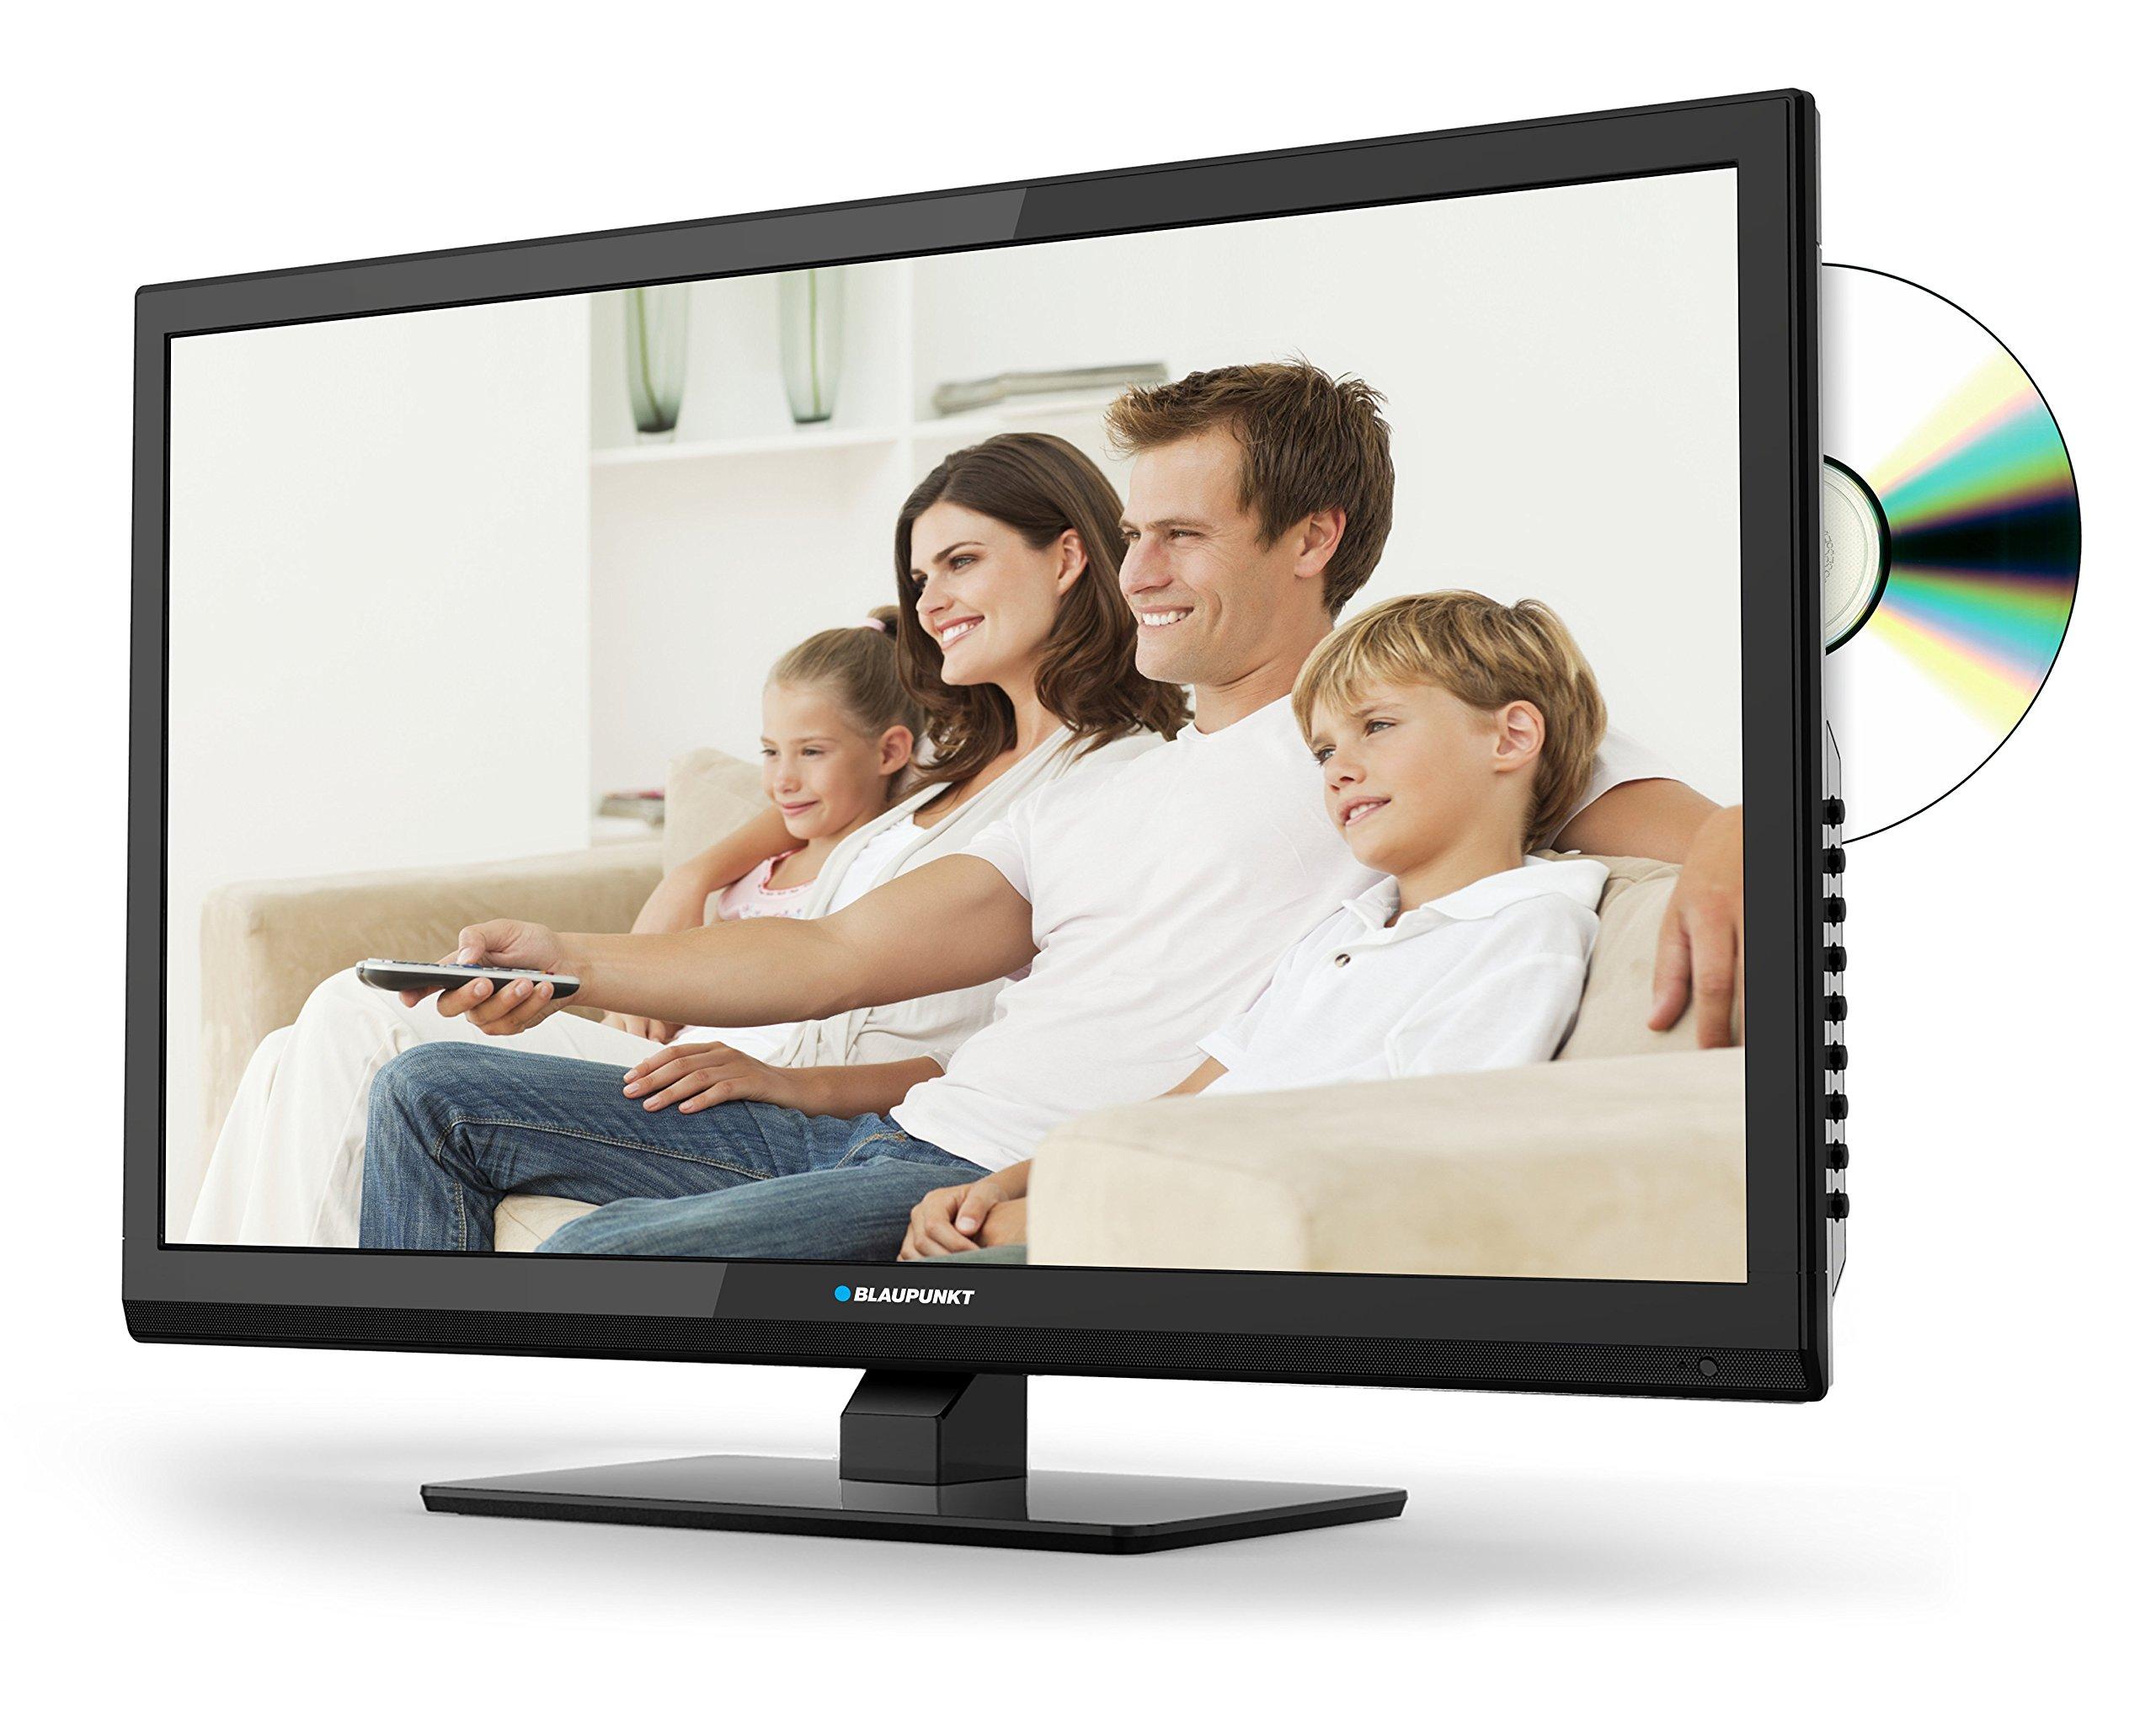 23 LED HDREADY +DVB-T/C E Sat: Amazon.es: Electrónica